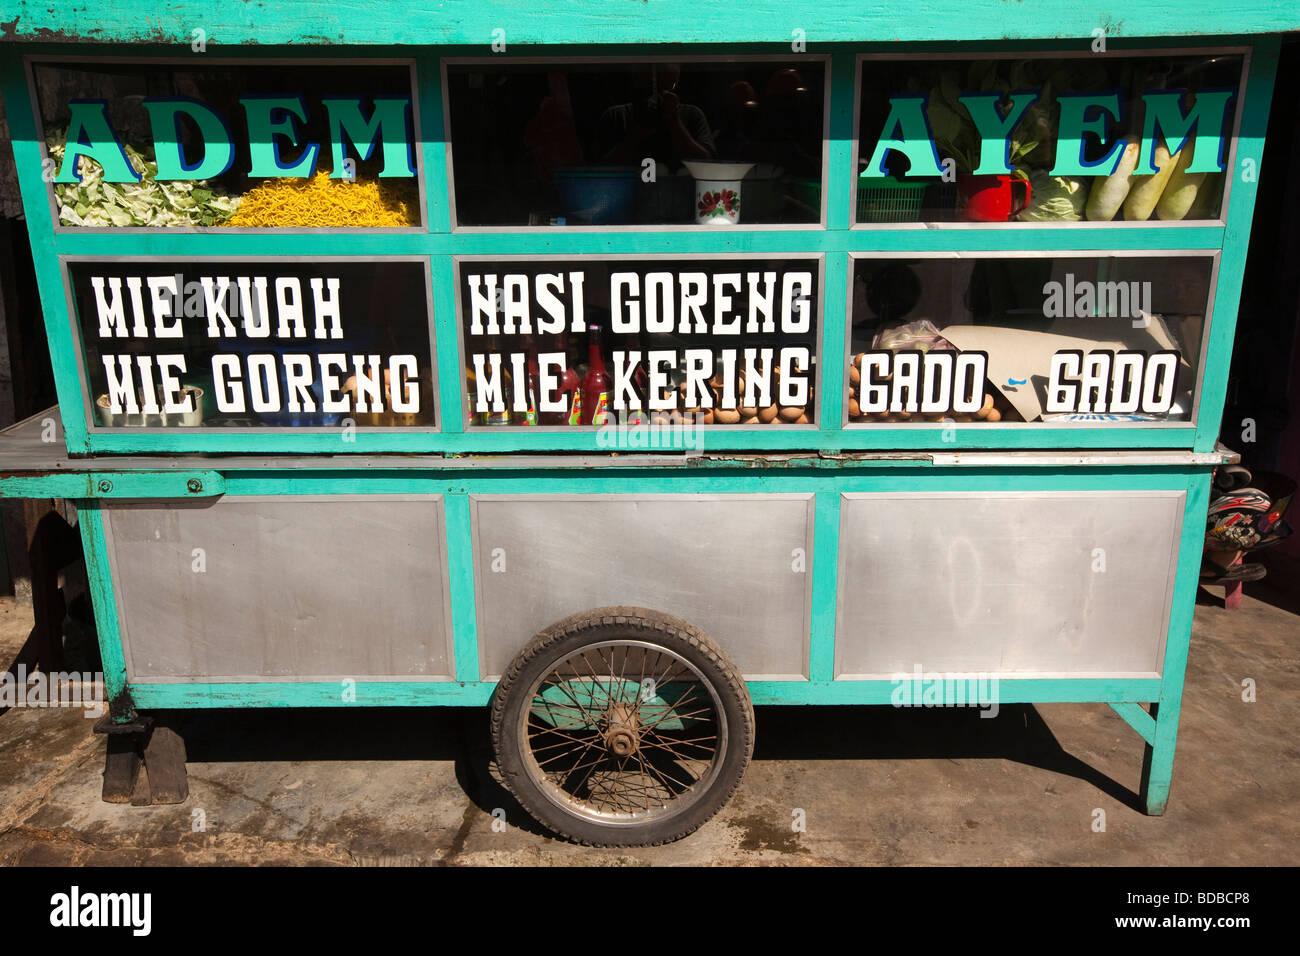 Indonesia Sulawesi Barru Small Street Warung Stall Selling Cheap Fast Food